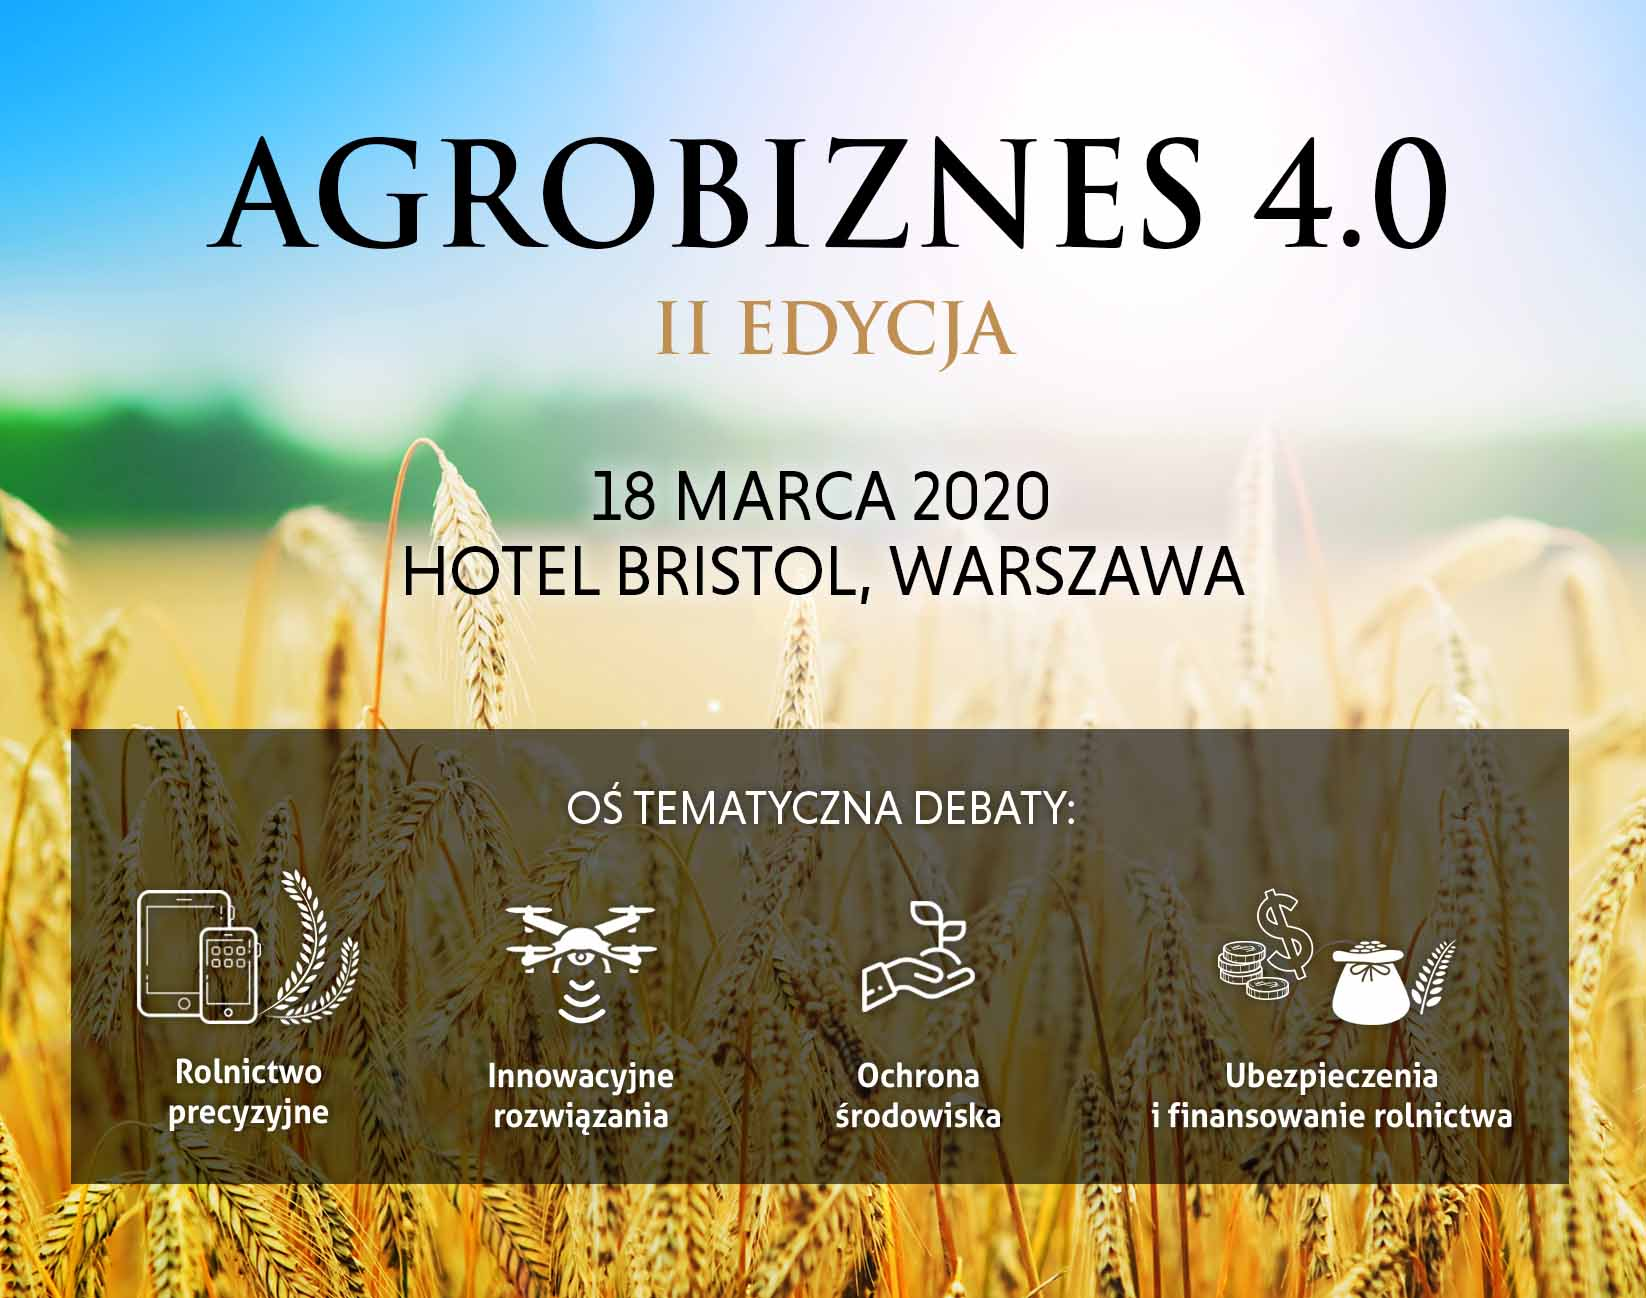 Agrobiznes 4.0